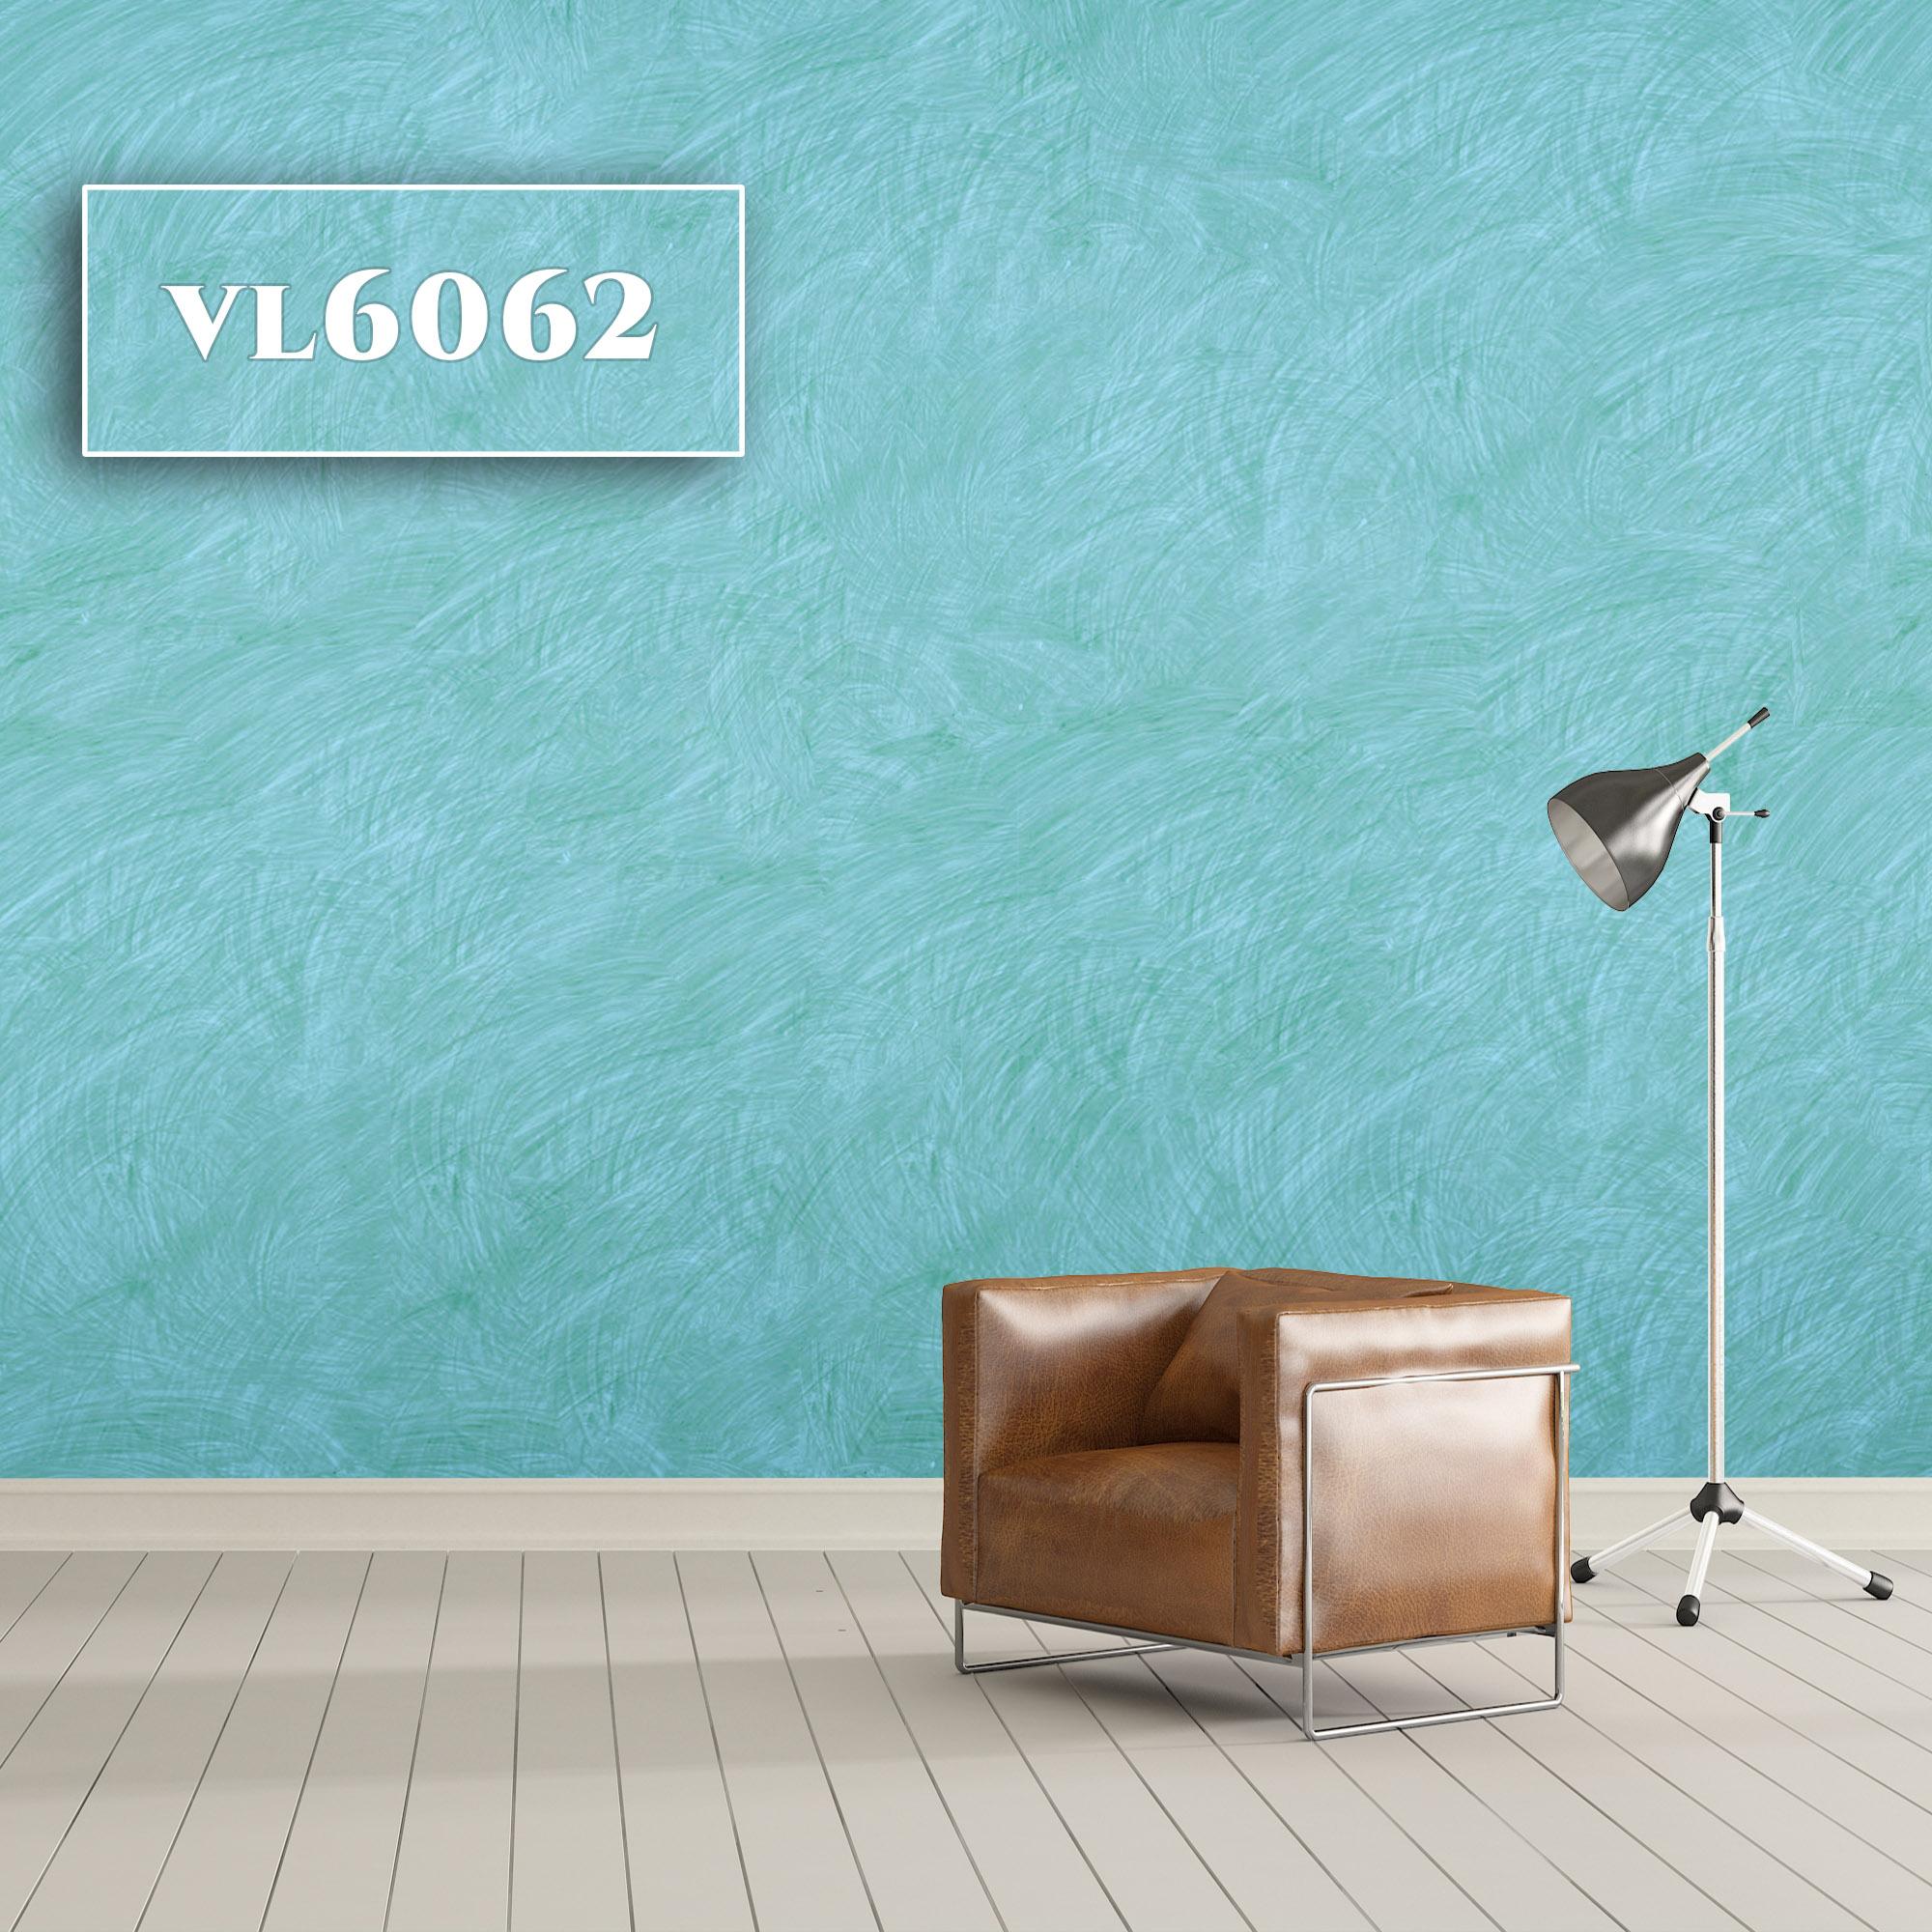 VL6062